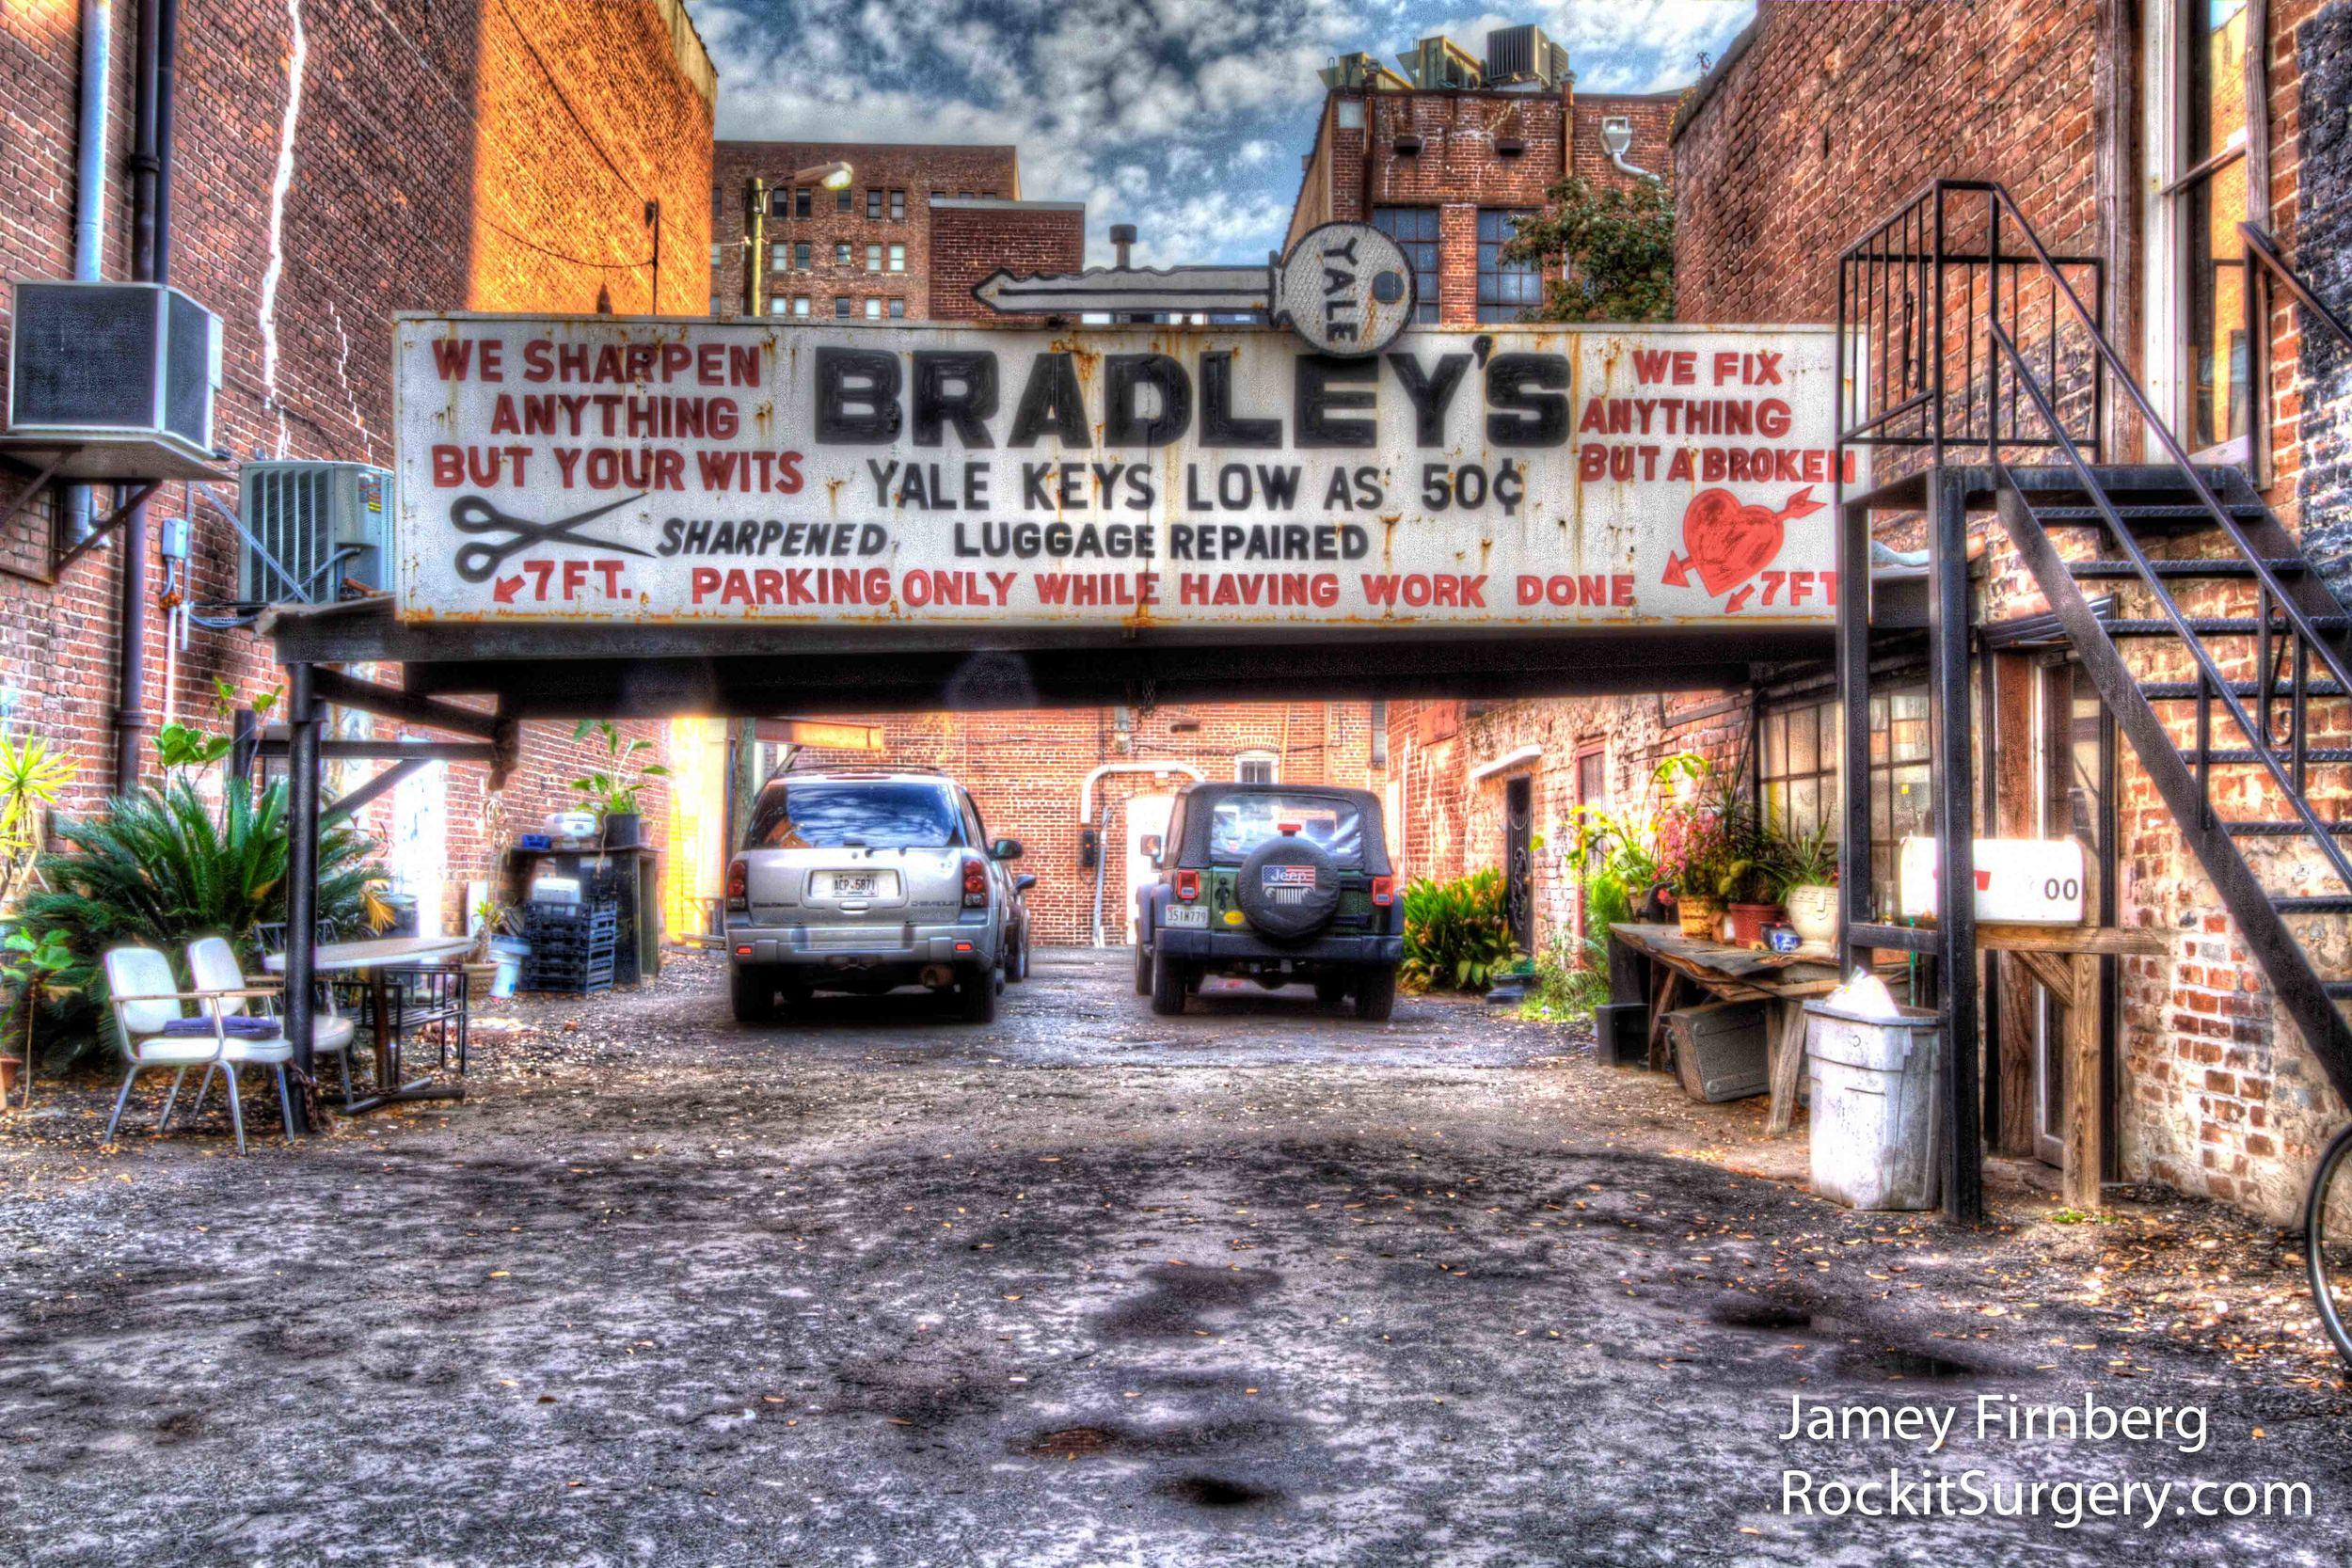 Bradley's Locksmith Parking.jpg